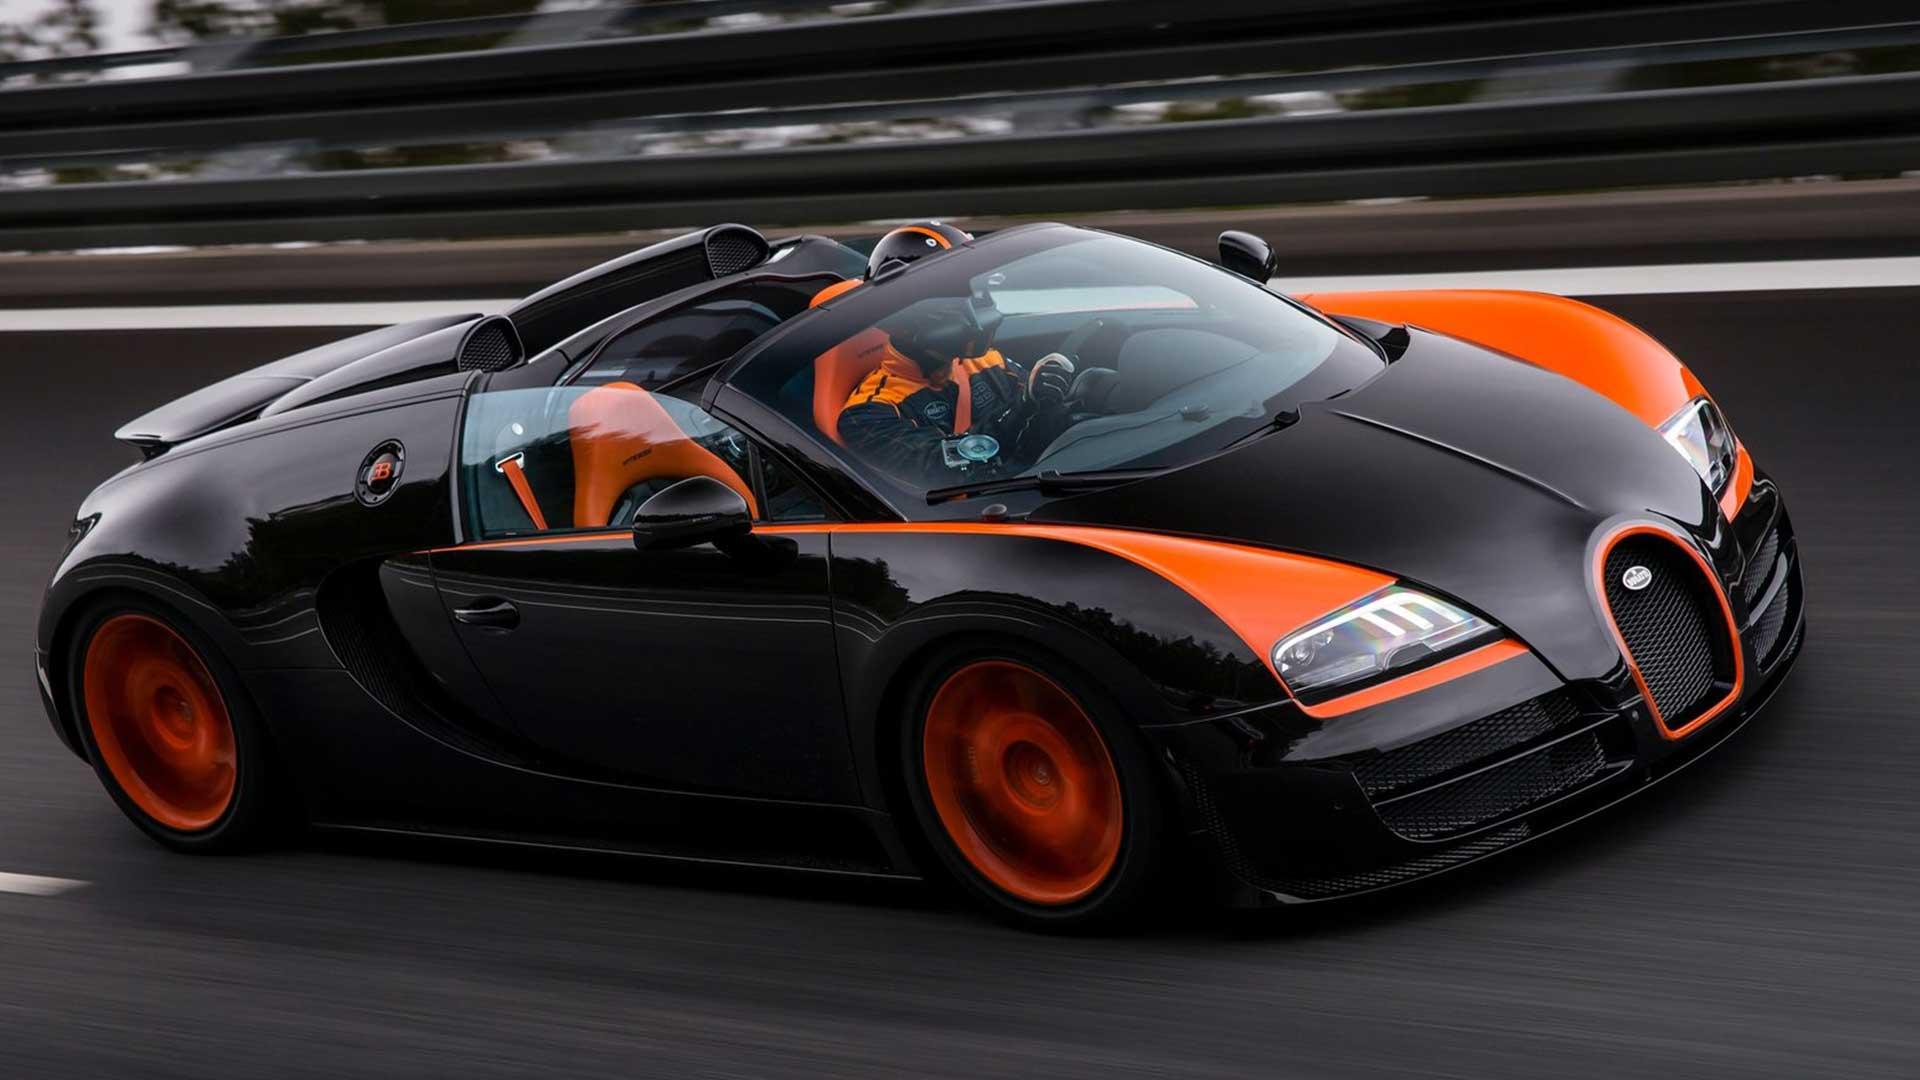 2013 Bugatti Veyron Grand Sport Vitesse WRC Image in HD Resolution  Wallpapers Download